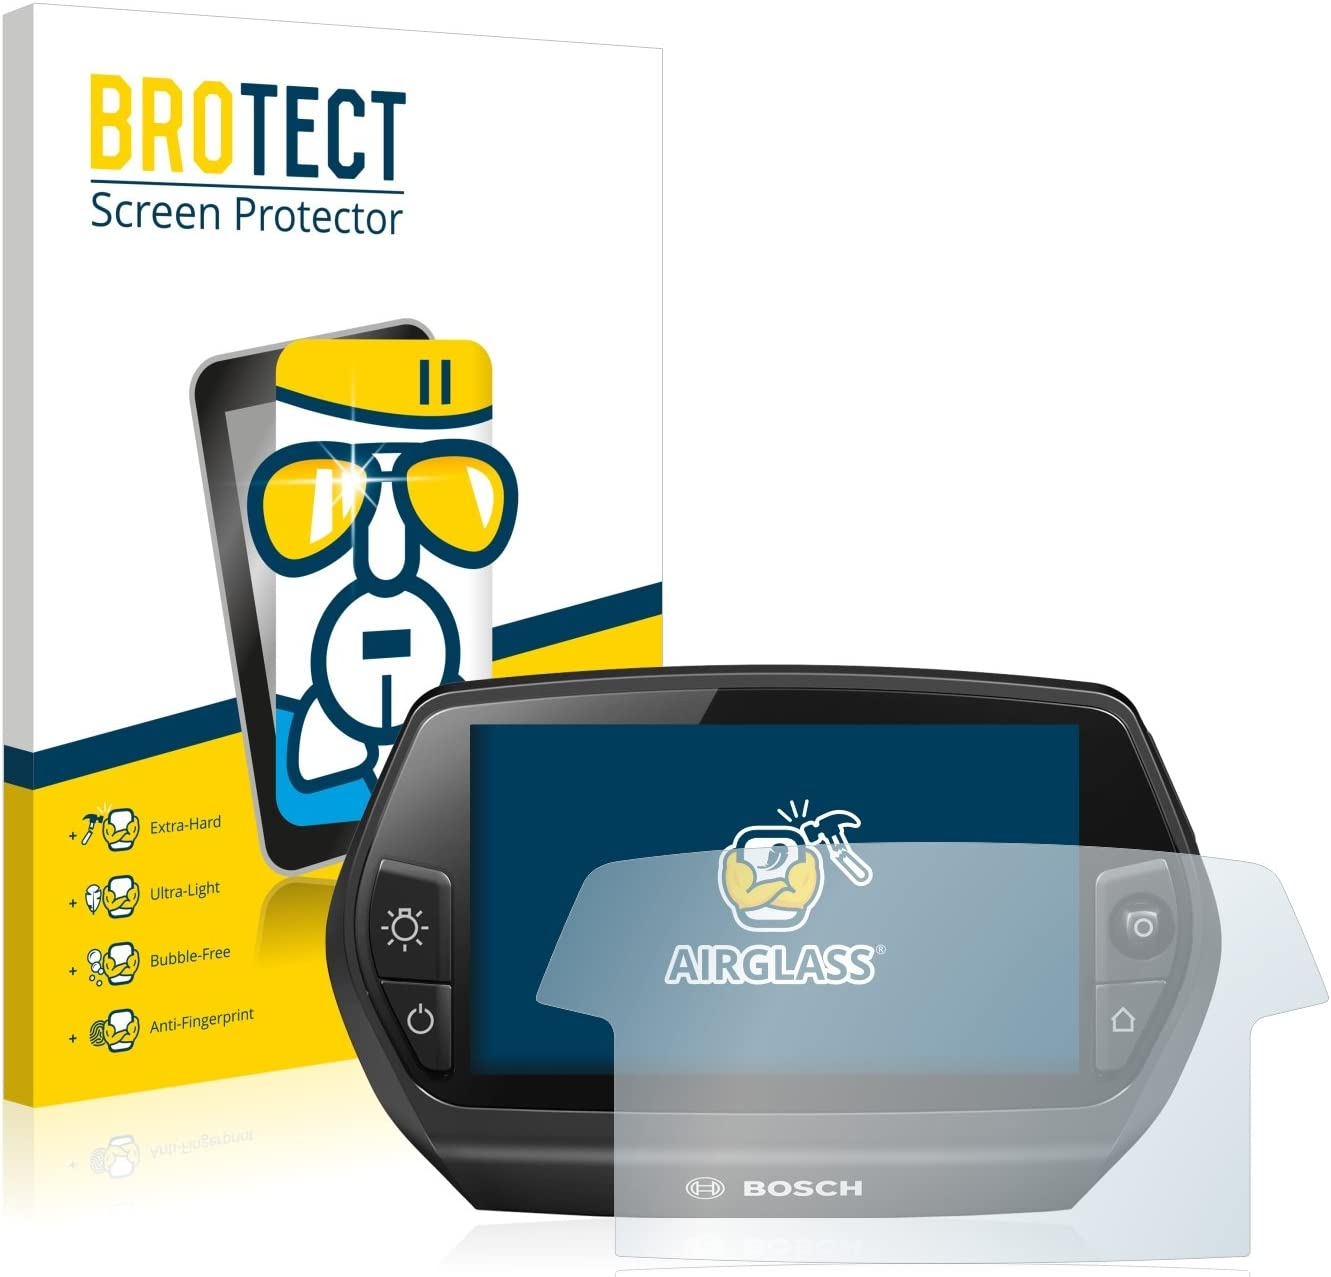 Ultra-transparent Anti-Fingerprint extrem Kratzfest 3 St/ück - AirGlass BROTECT Panzerglas Schutzfolie kompatibel mit Bosch Nyon 2020